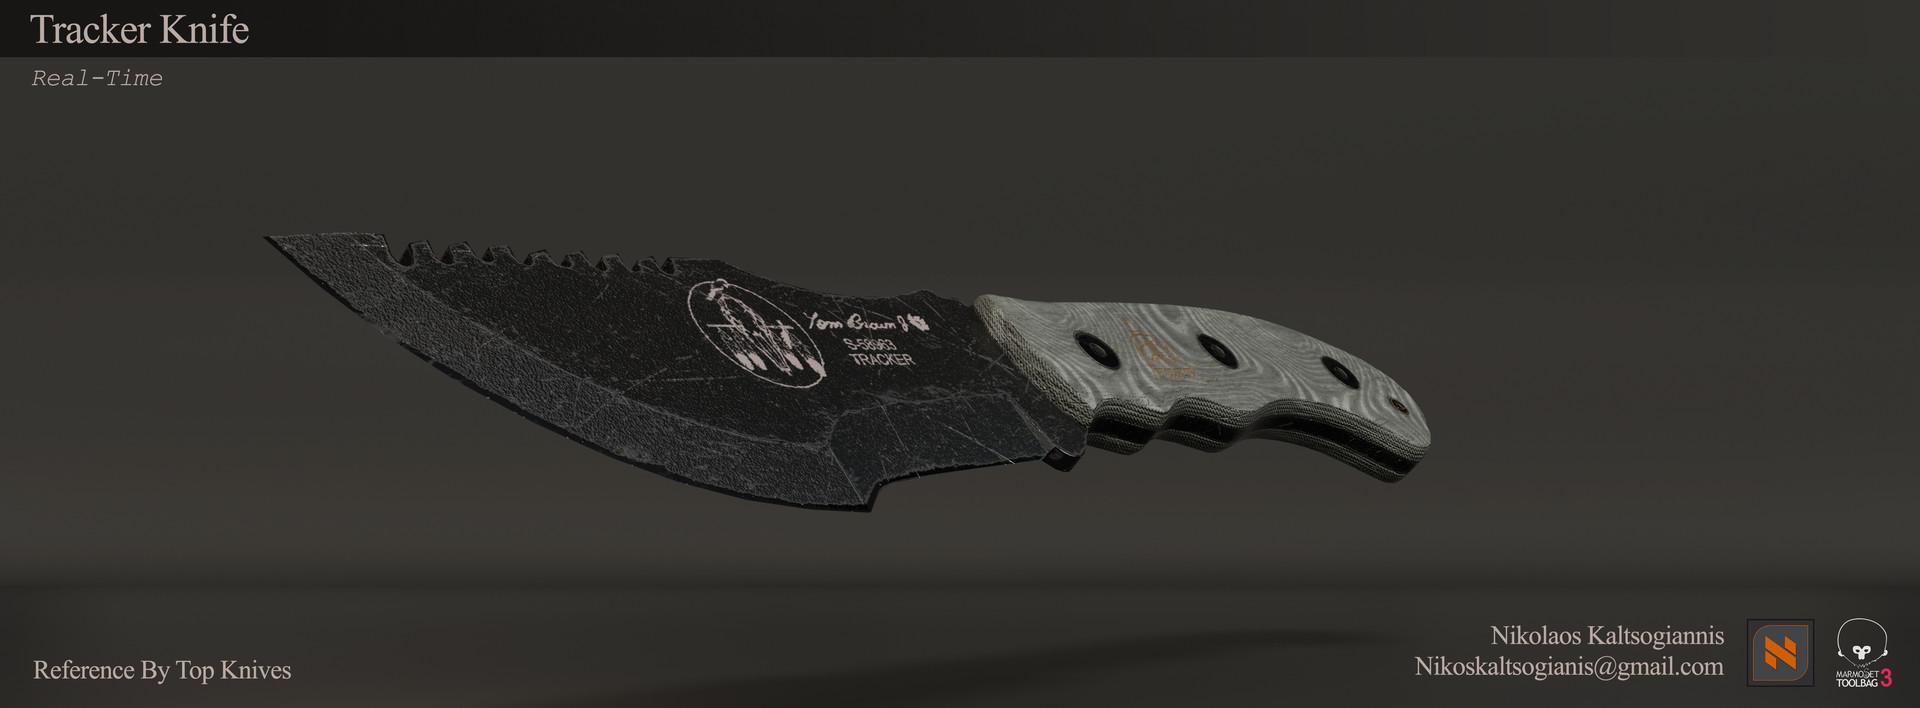 Nikolaos kaltsogiannis tracker knife presentation 03